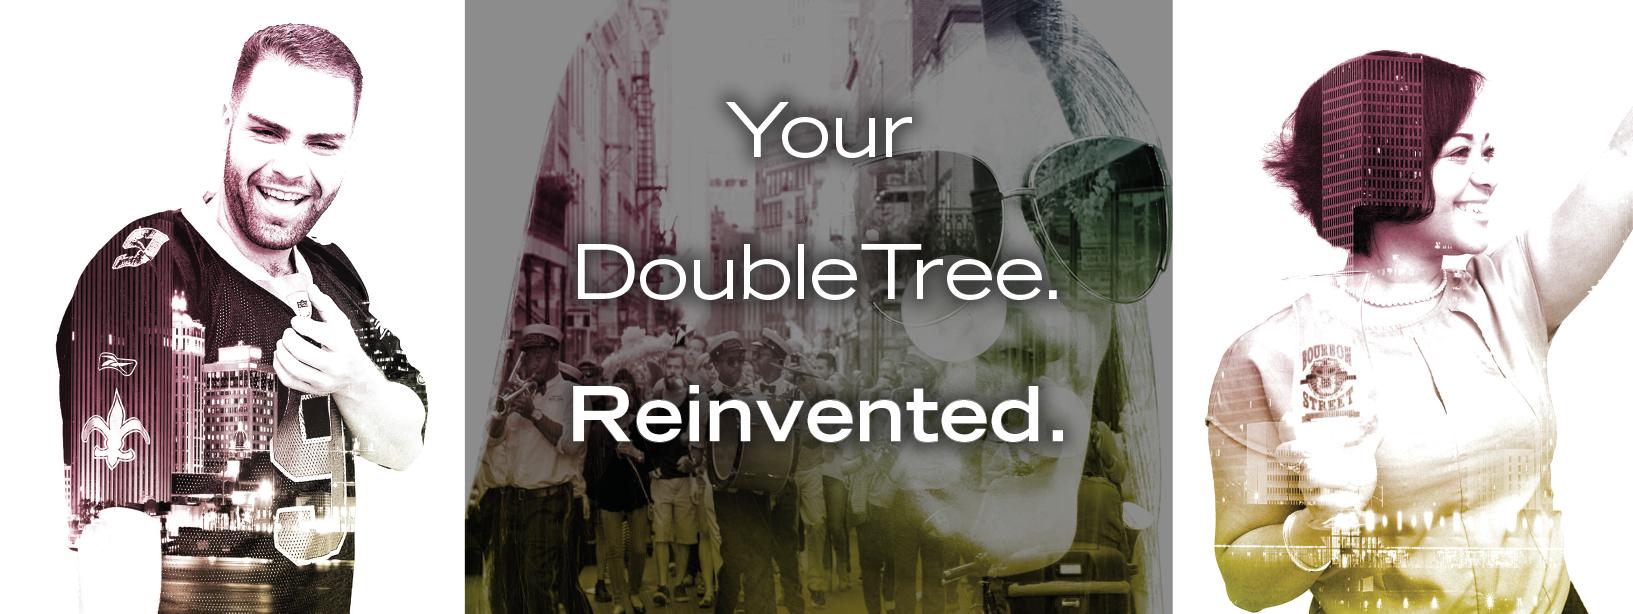 #doubletreedoubletake invite design